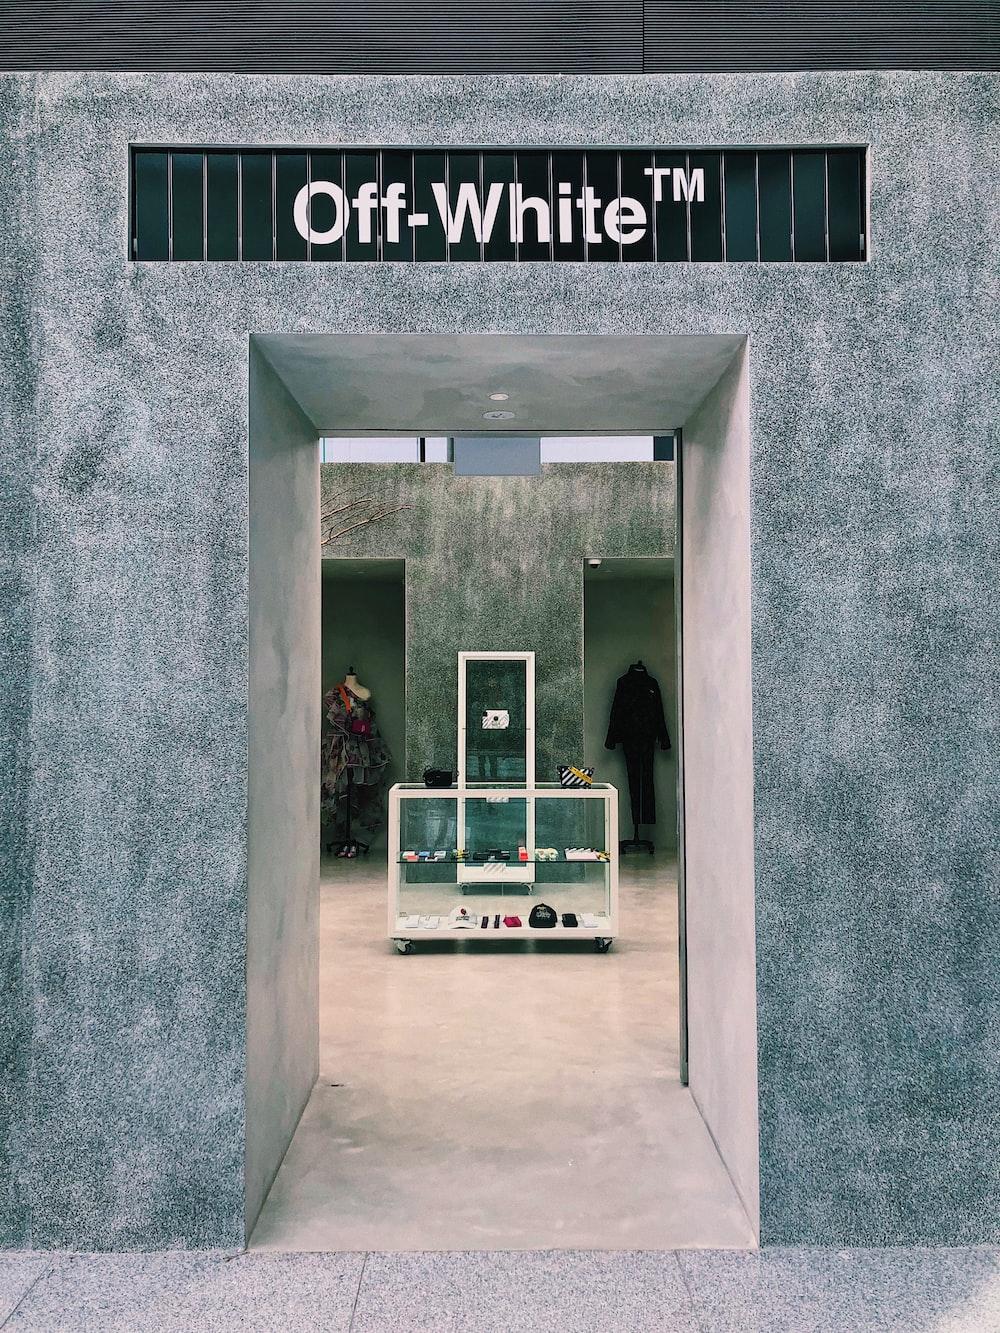 off-white walls